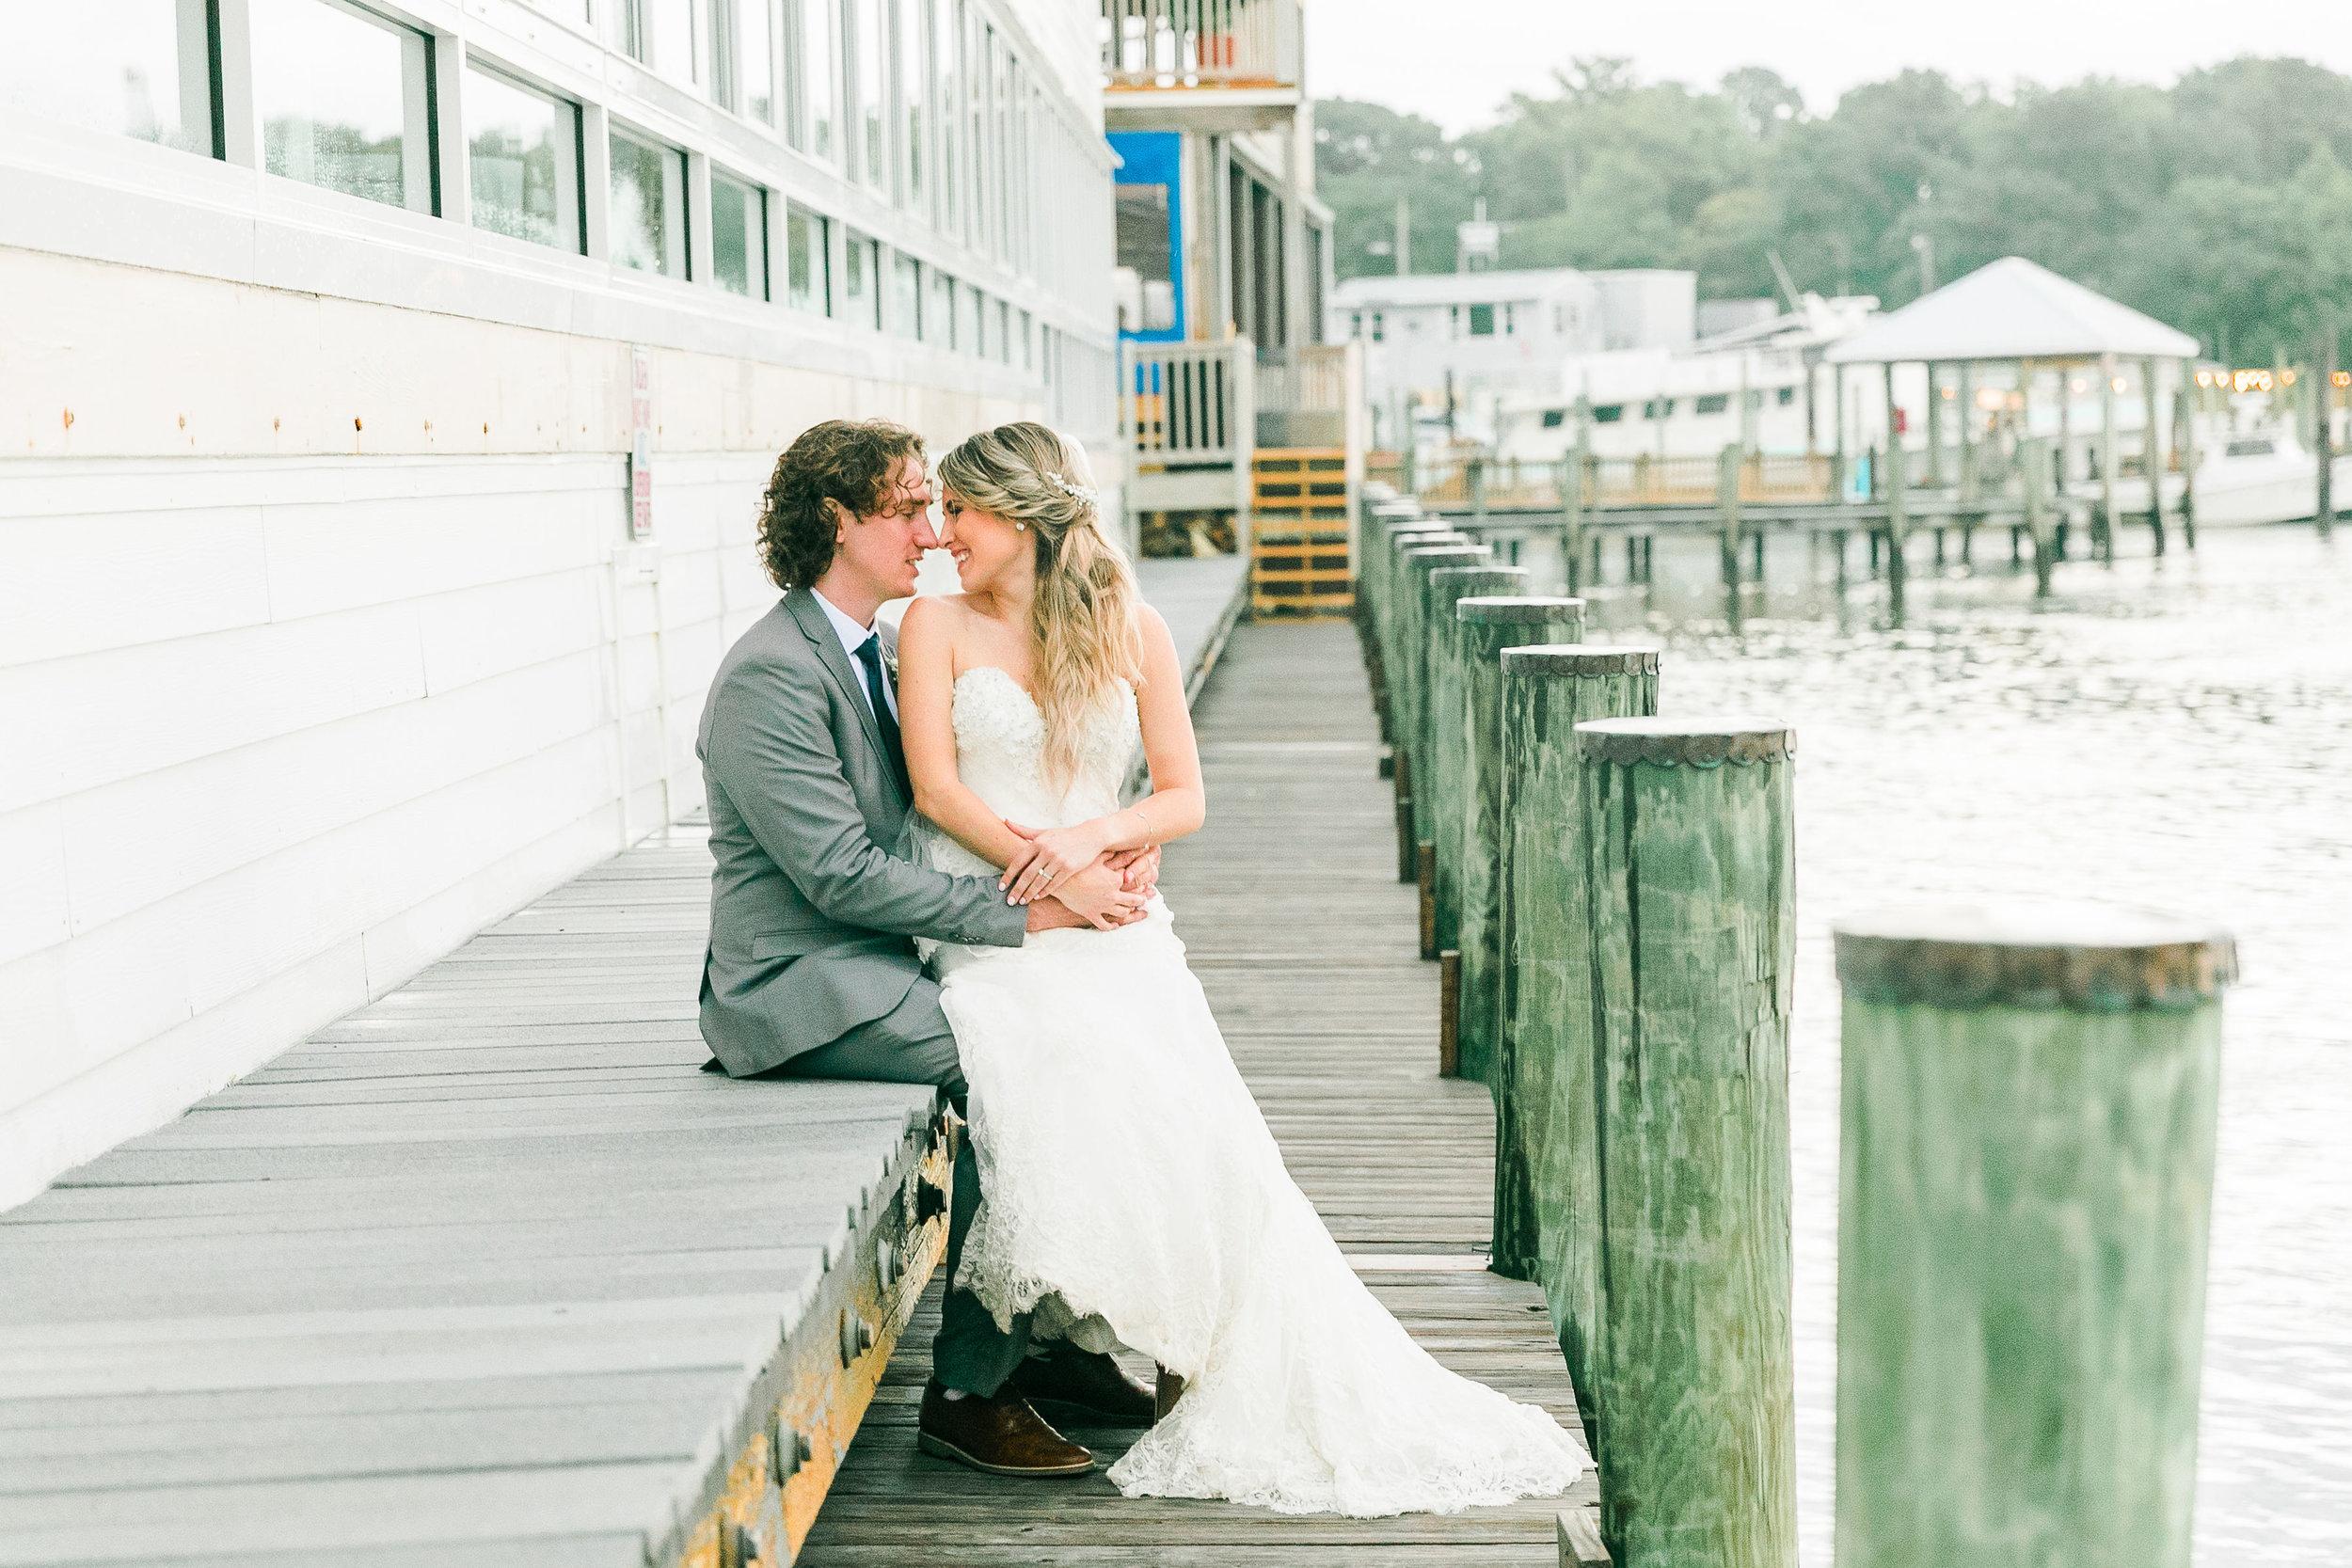 Nicole&Bryce_Bride&GroomPortraits-43.jpg